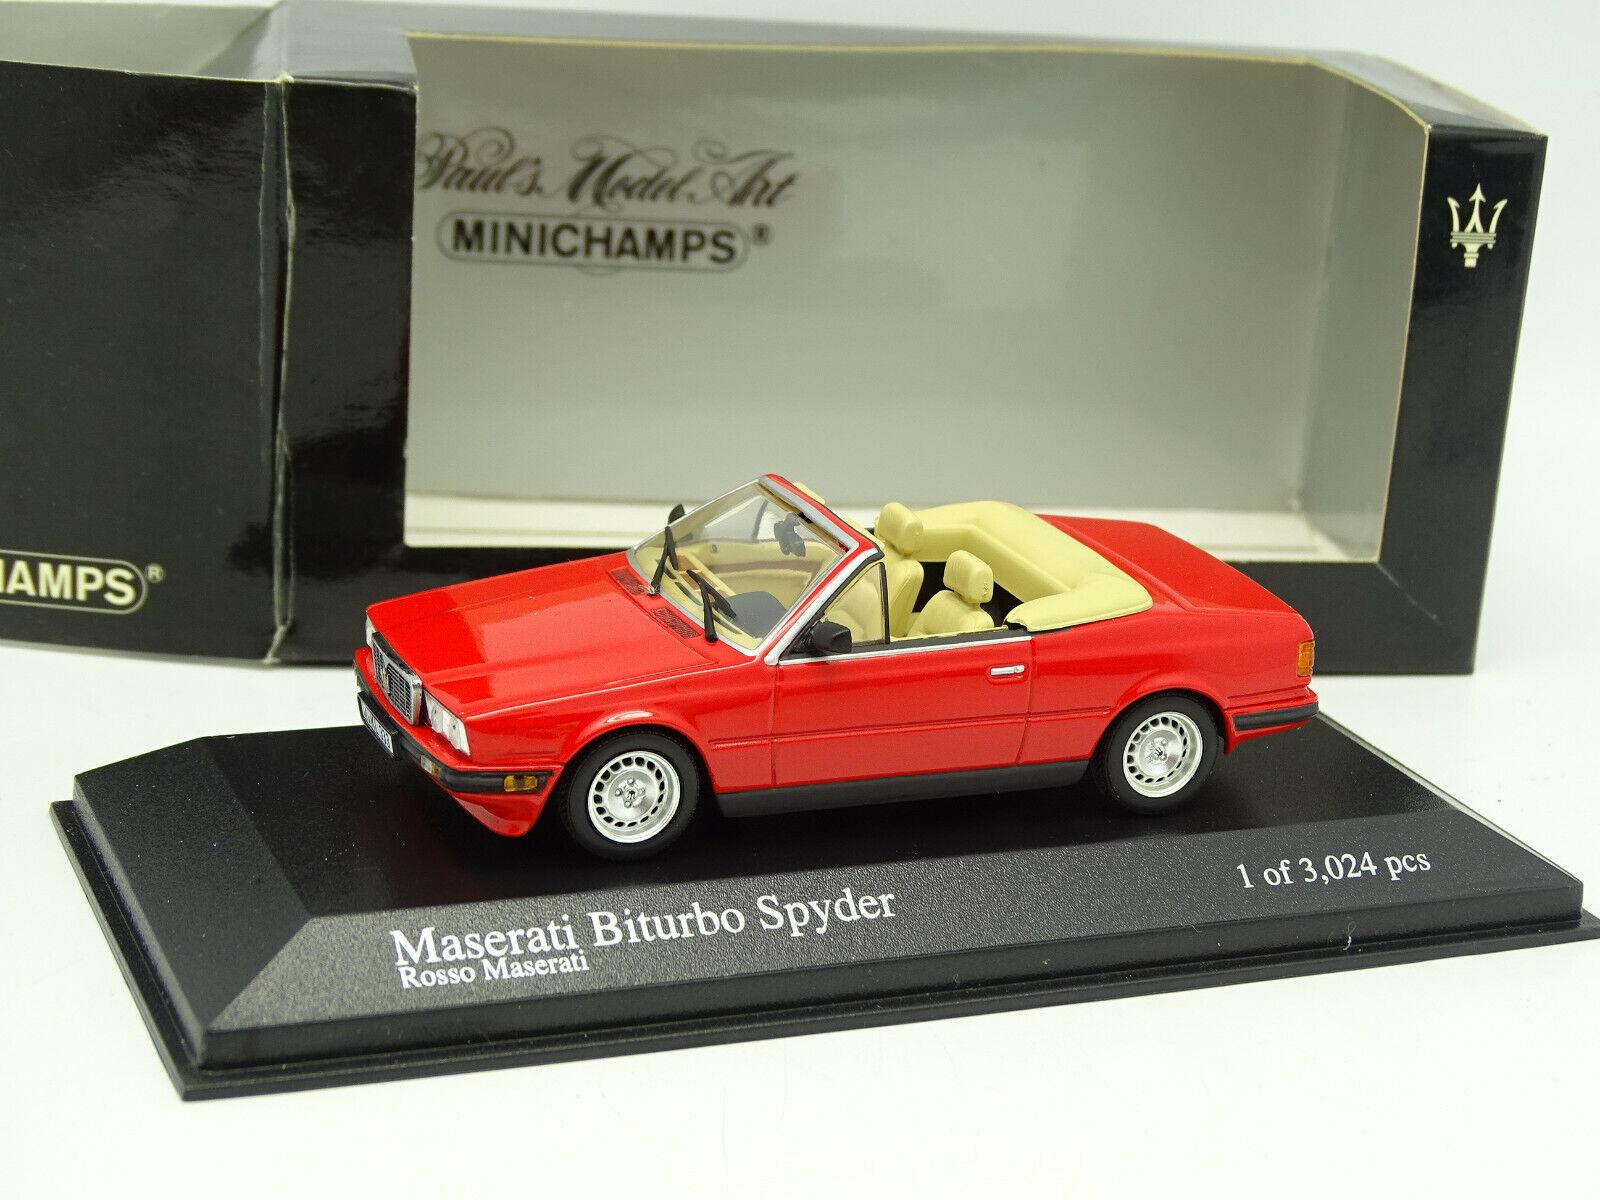 Minichamps 1 43 - maserati biturbo spyder red